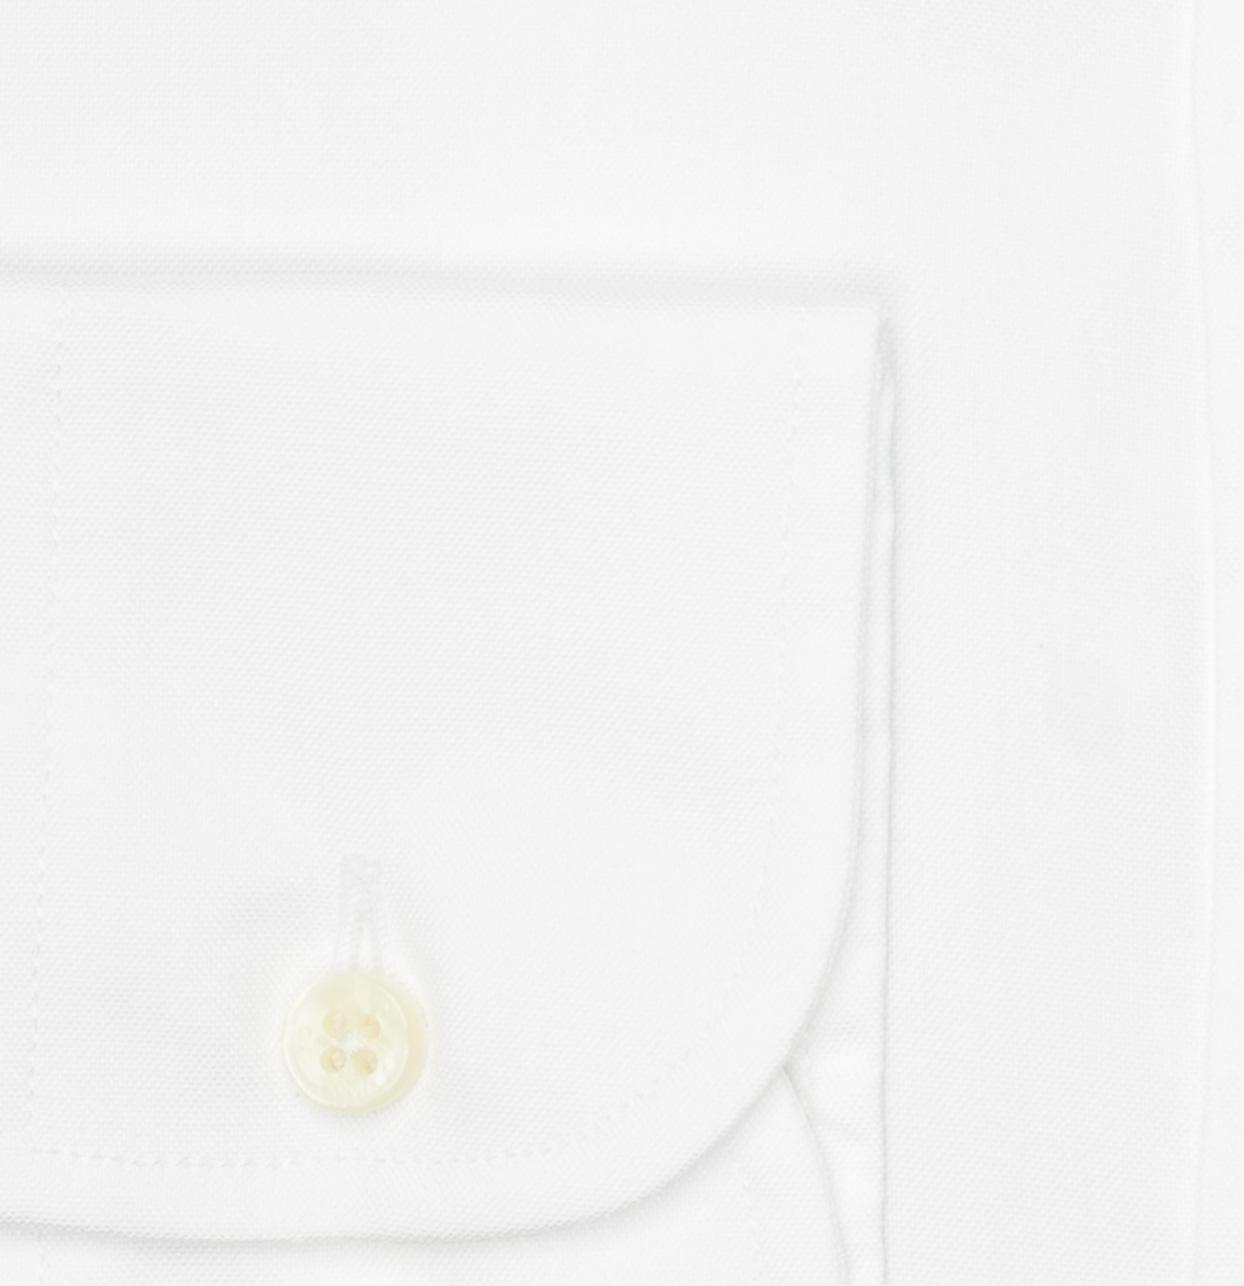 Camisa Formal Wear REGULAR FIT Modelo BOTTON DOWN Tejido Pin point color blanco, 100% Algodón - Ítem1